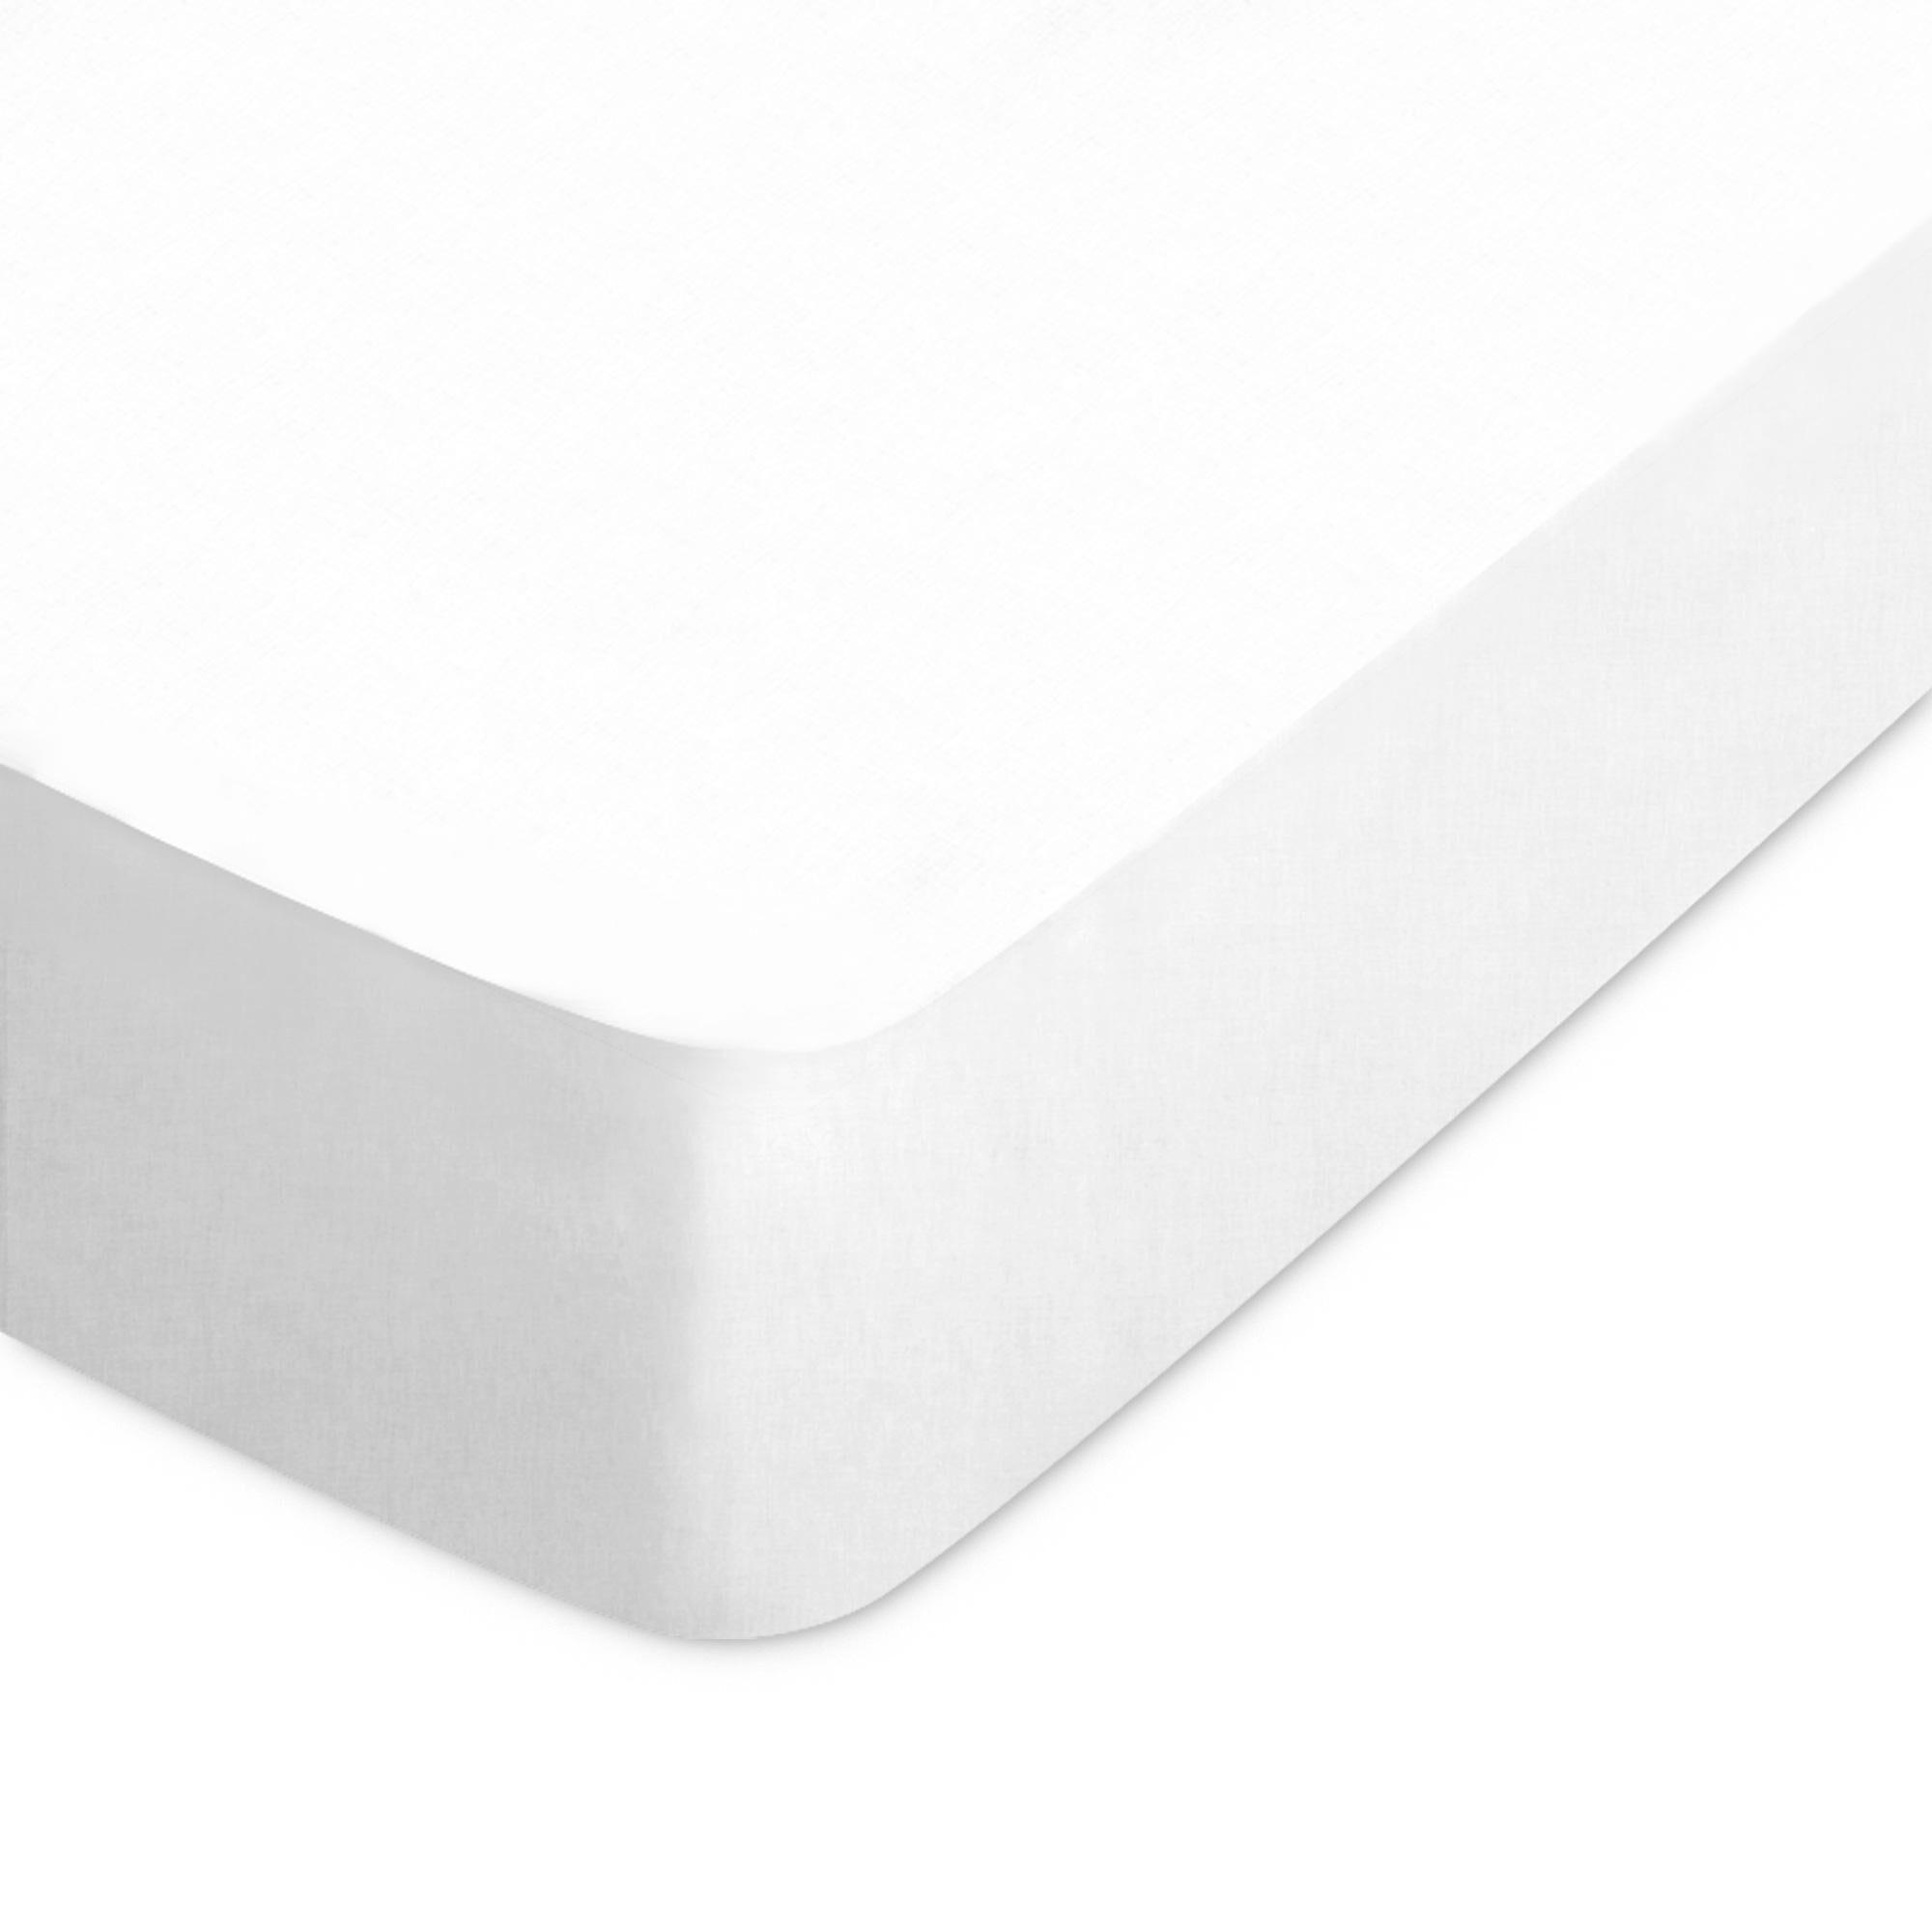 Linnea Drap housse uni 60x120 cm 100% coton ALTO Blanc